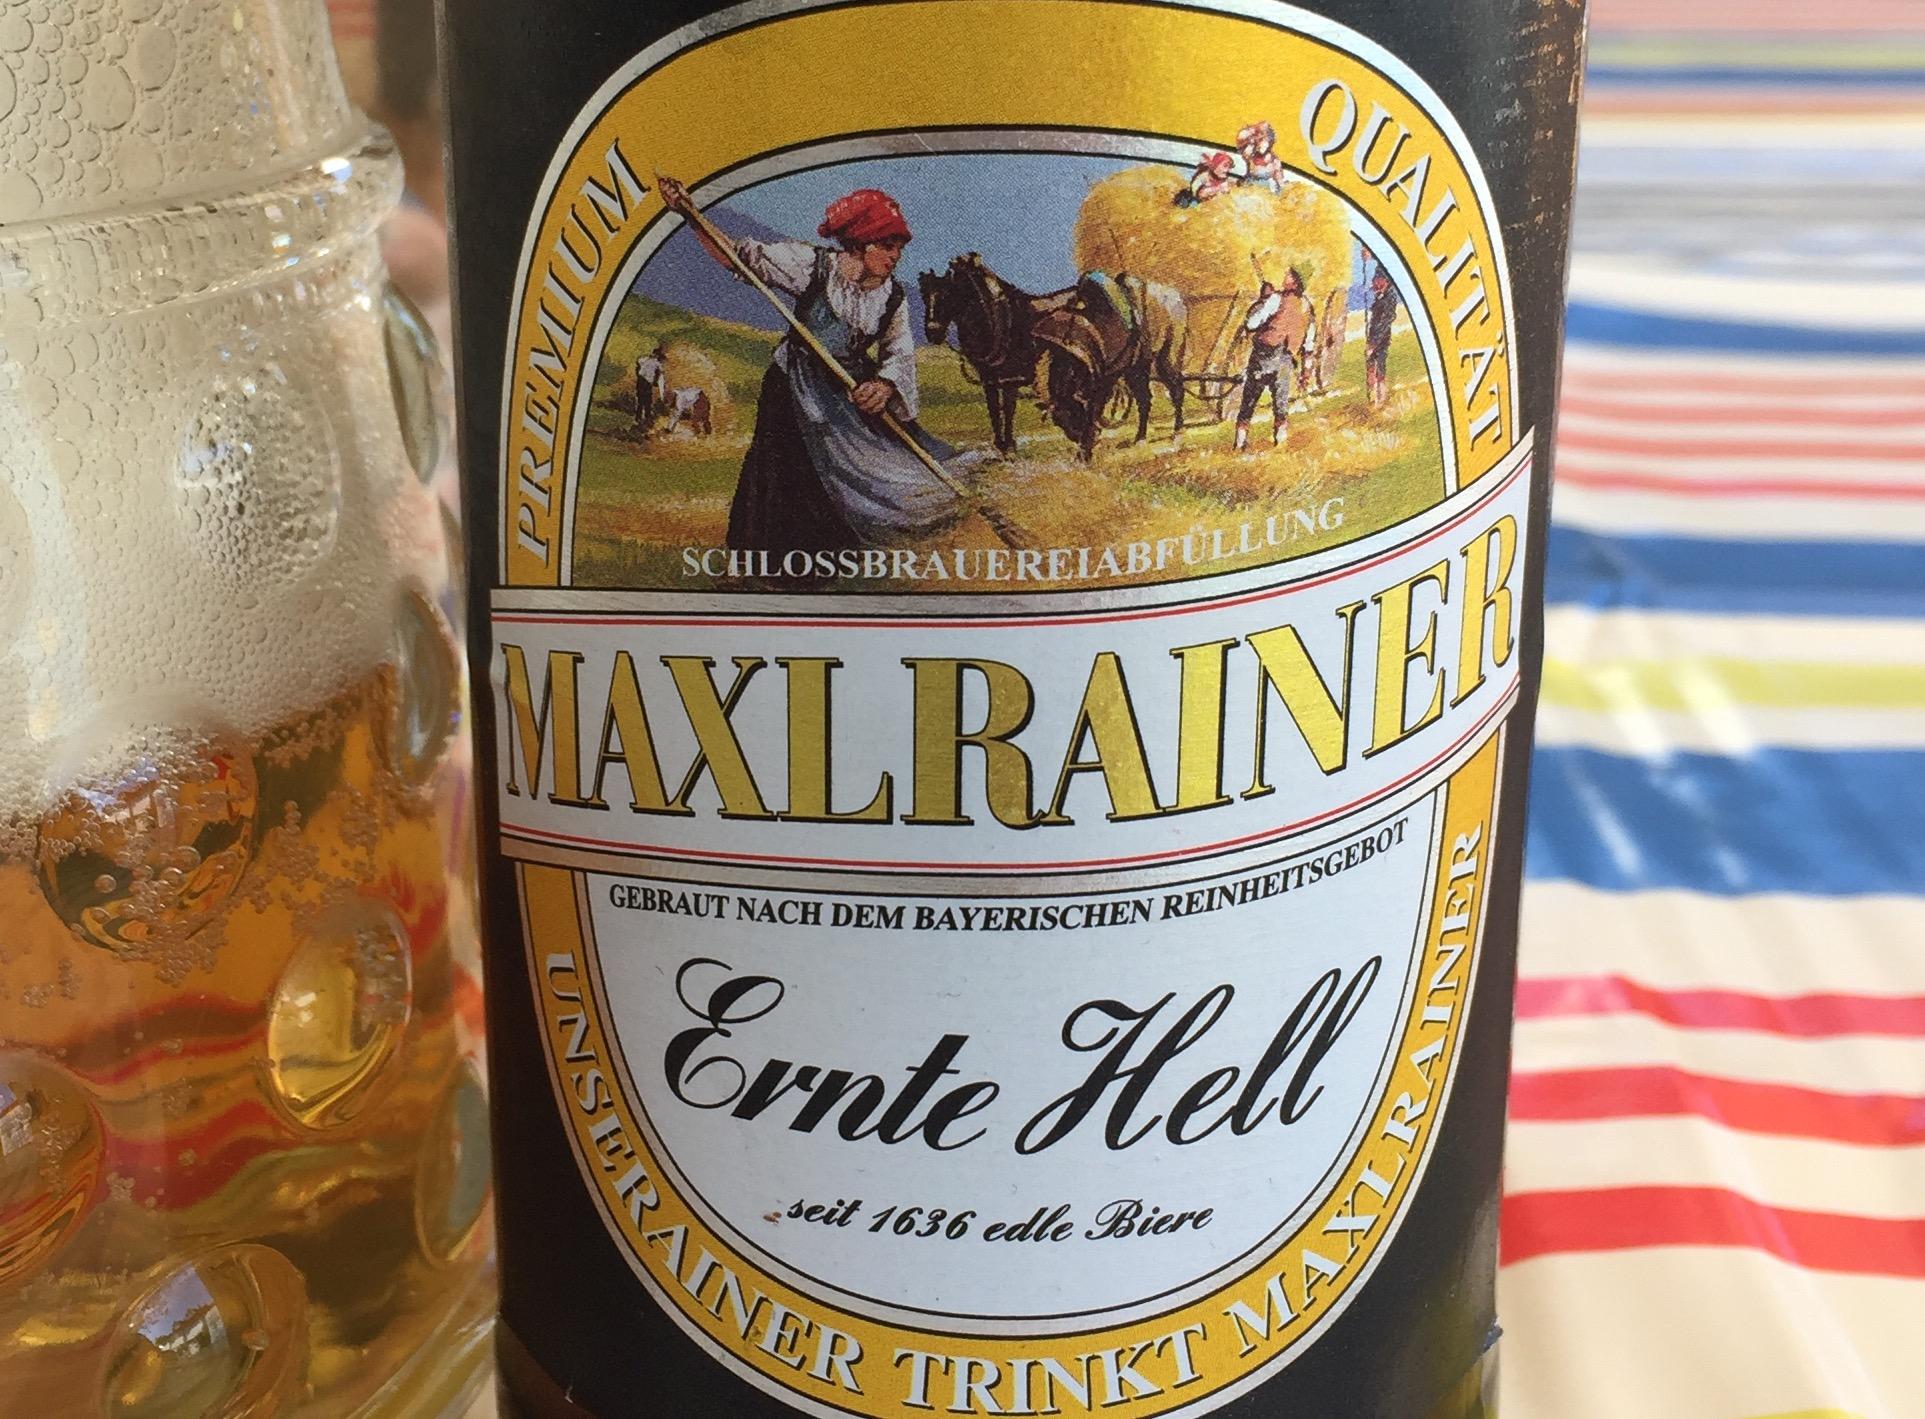 Maxlrainer - Ernte Hell